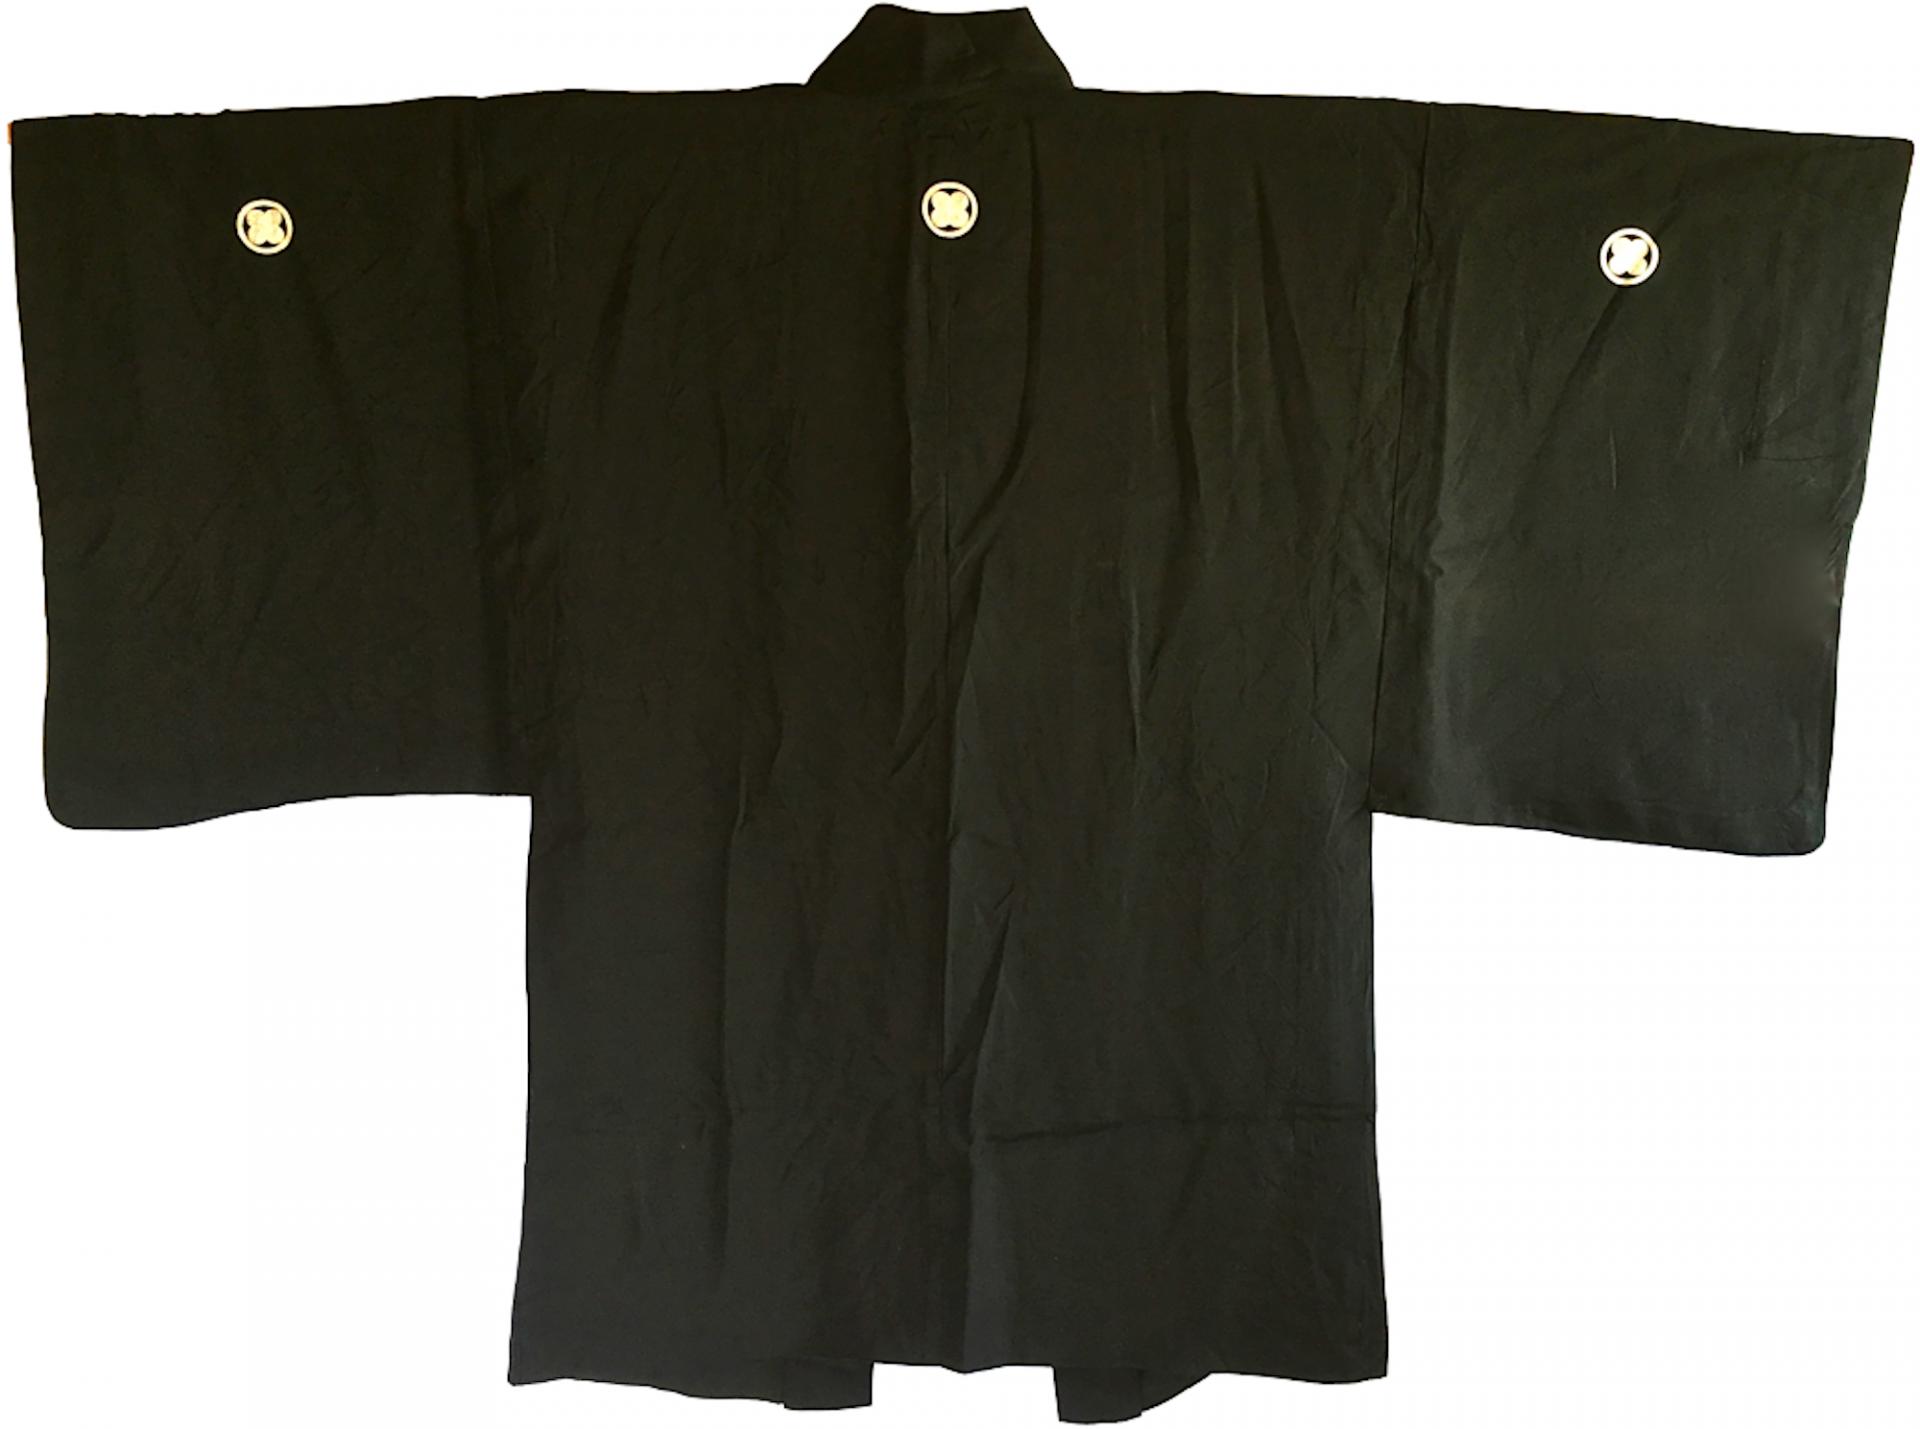 Antique haori samourai soie noire takano hane montsuki d e te homme 1